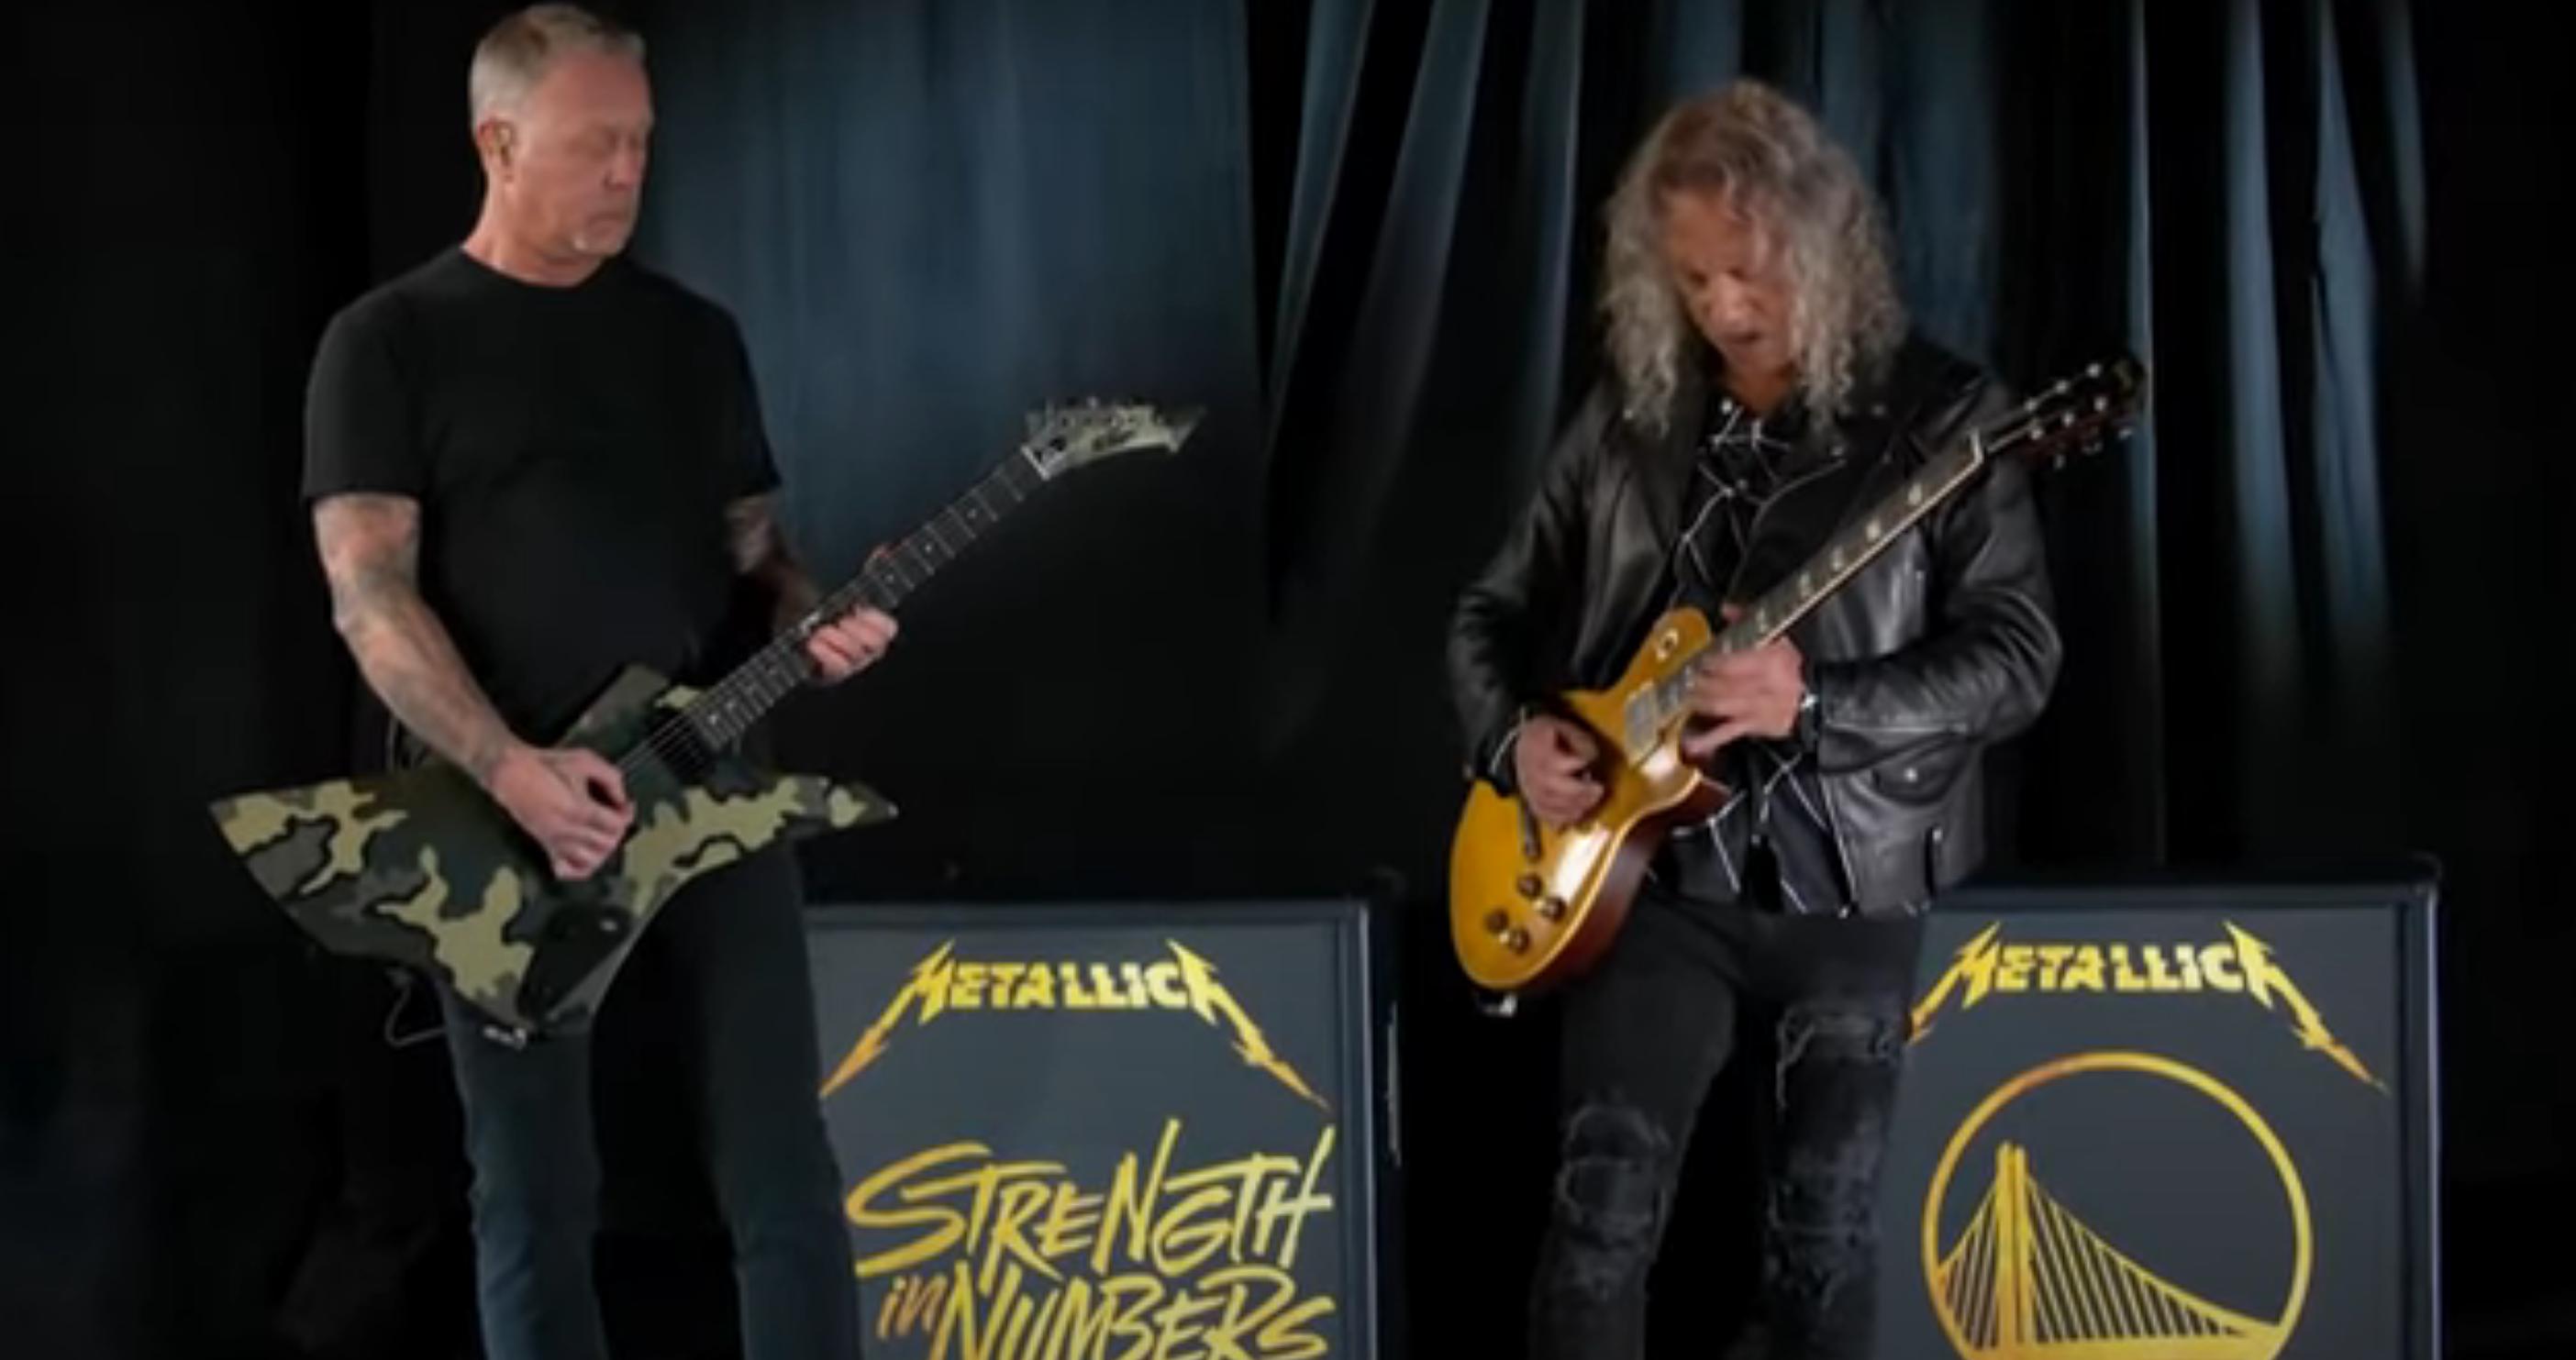 Metallica National Anthem 2021